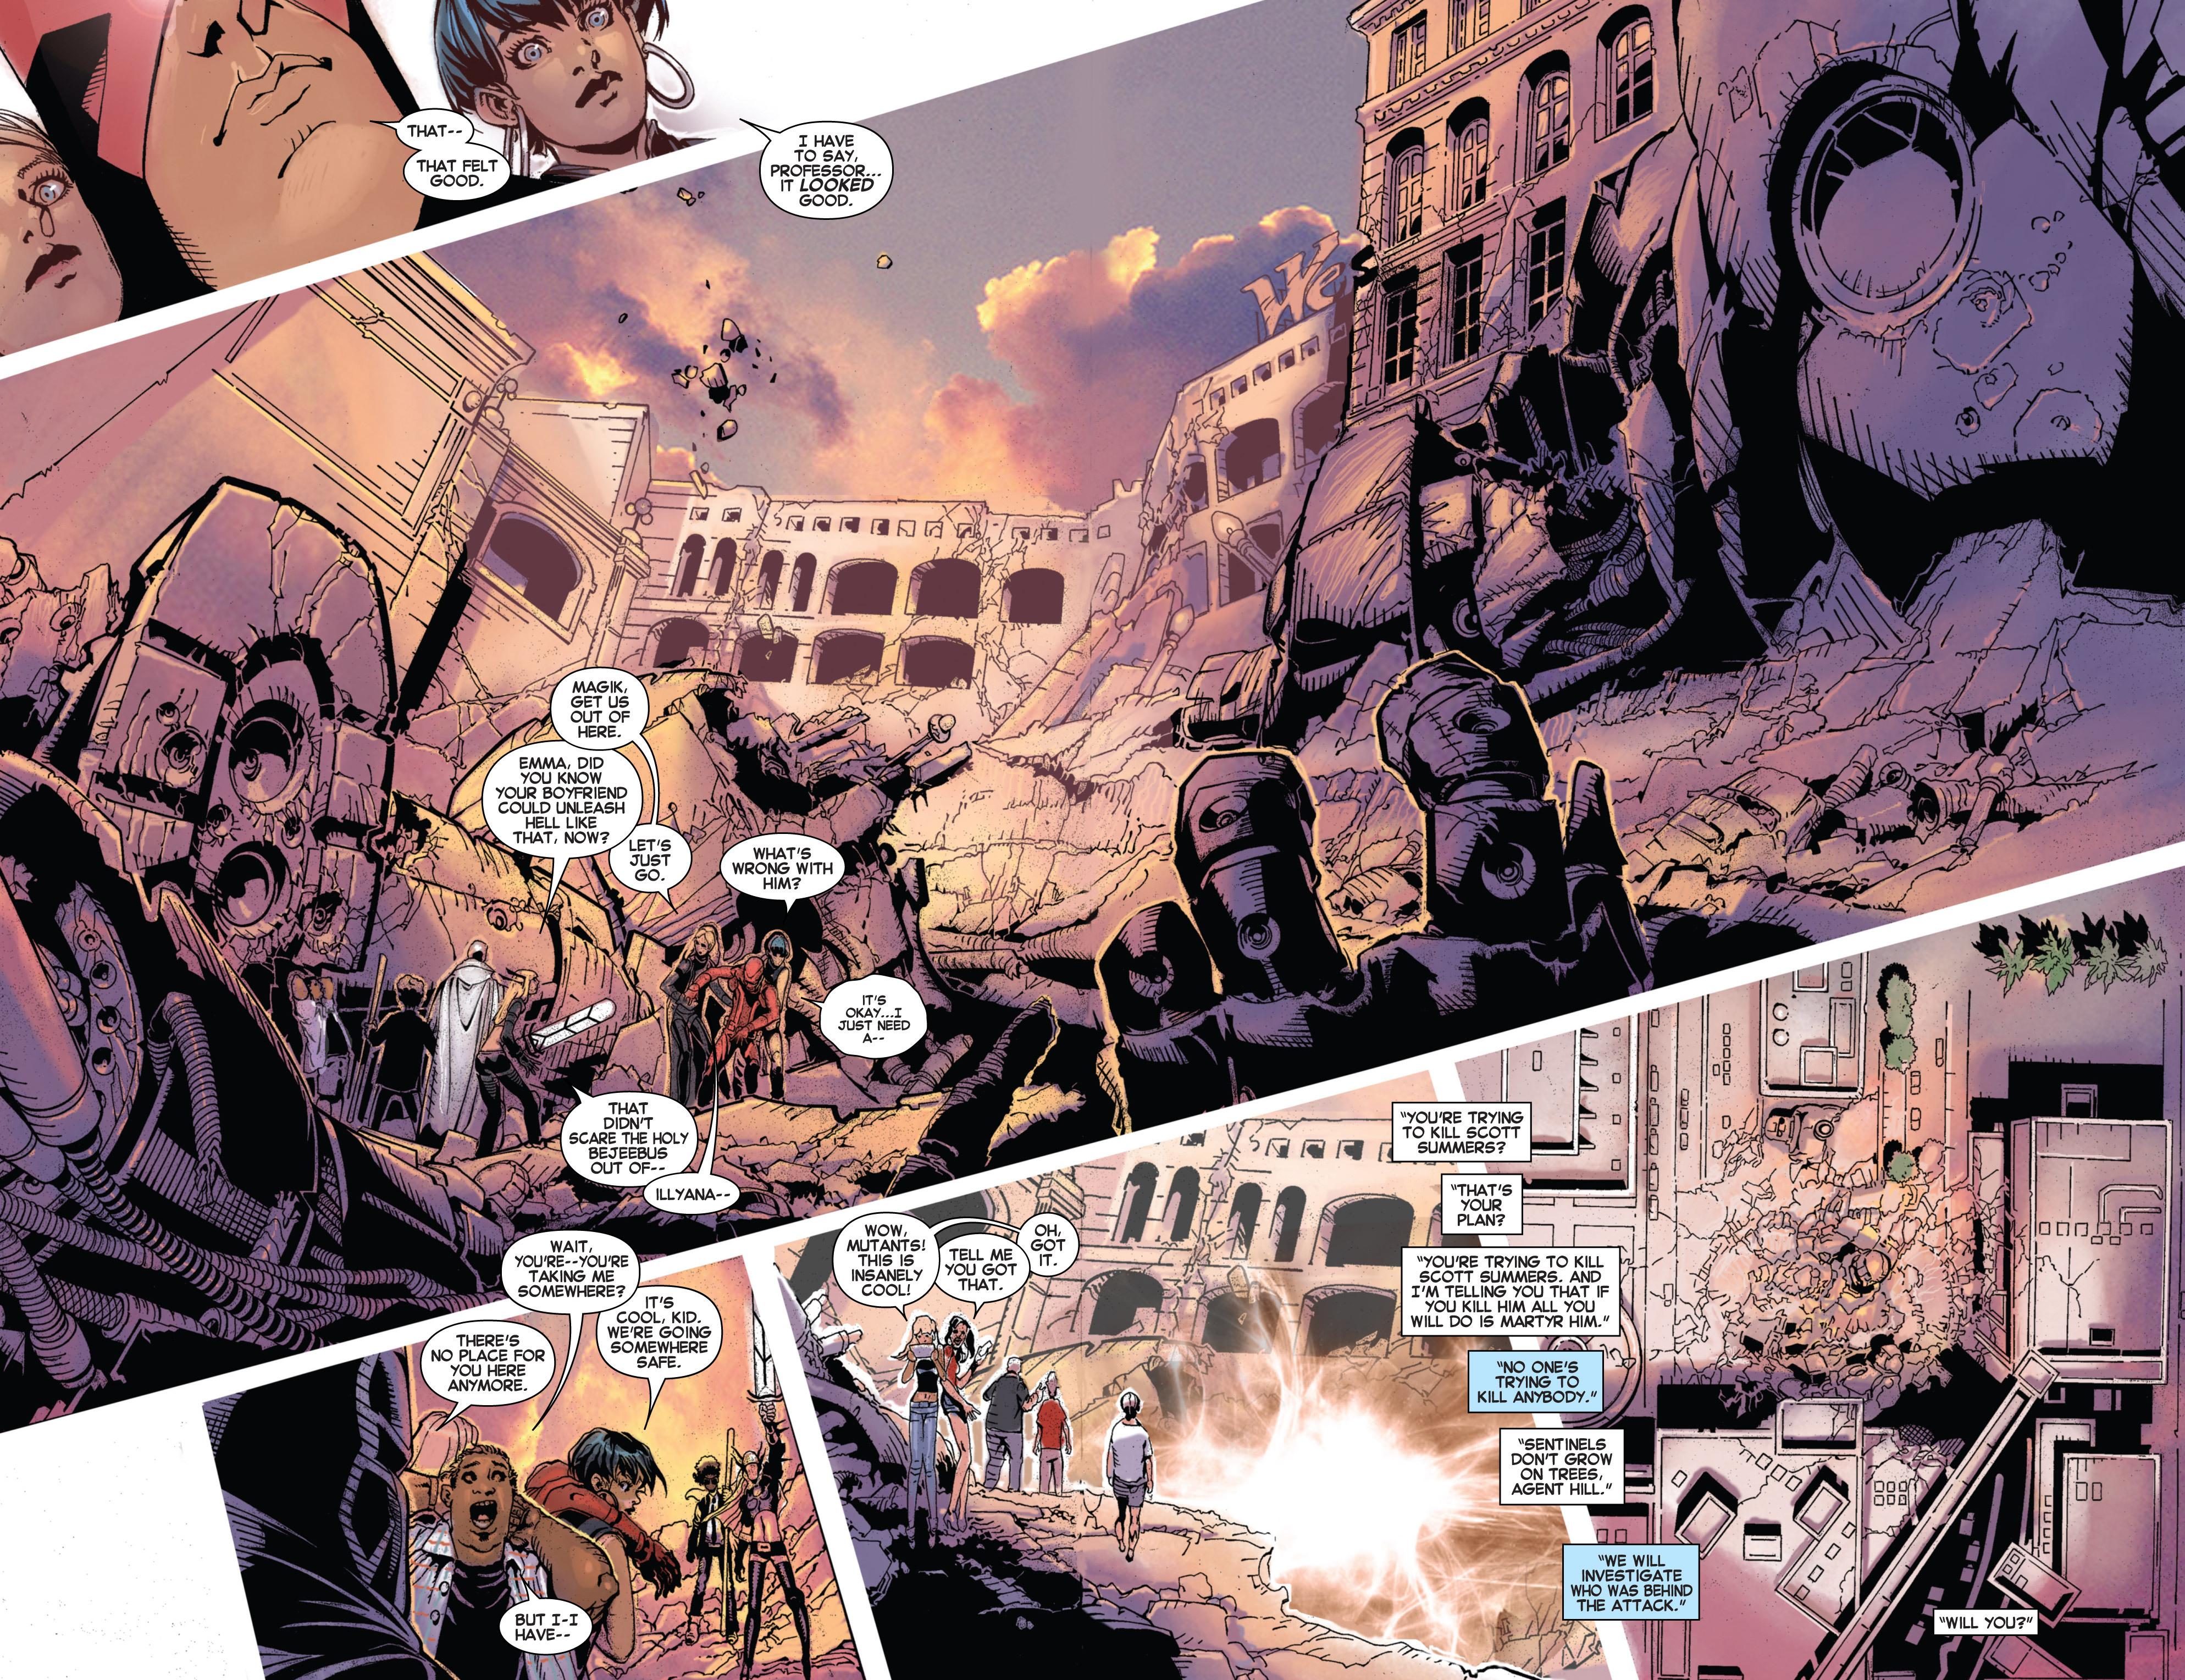 Read online Uncanny X-Men (2013) comic -  Issue # _TPB 1 - Revolution - 19